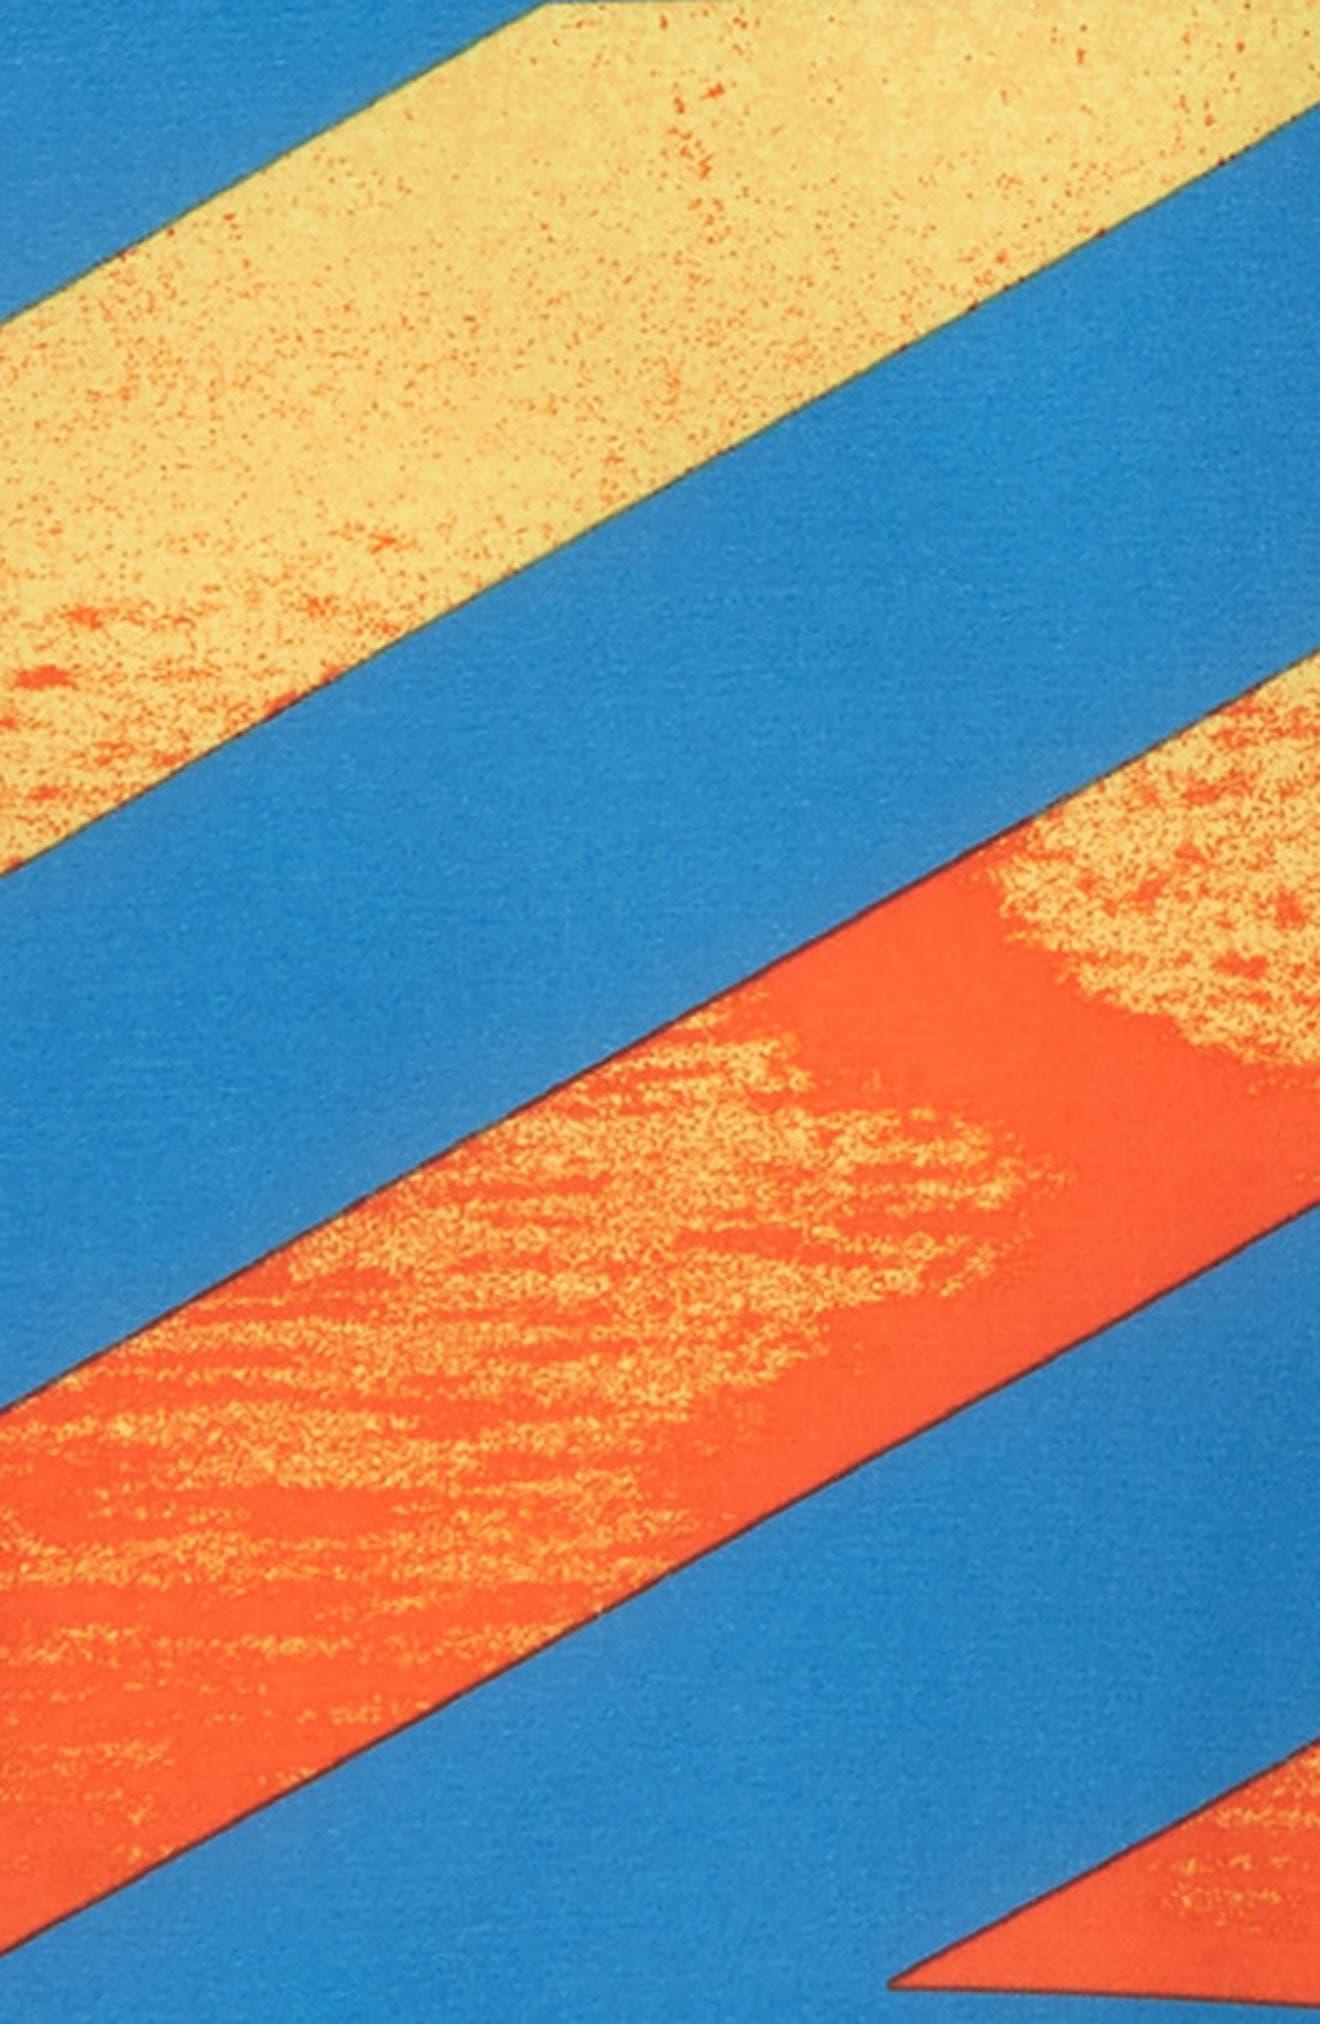 Macaw Mod Board Shorts,                             Alternate thumbnail 7, color,